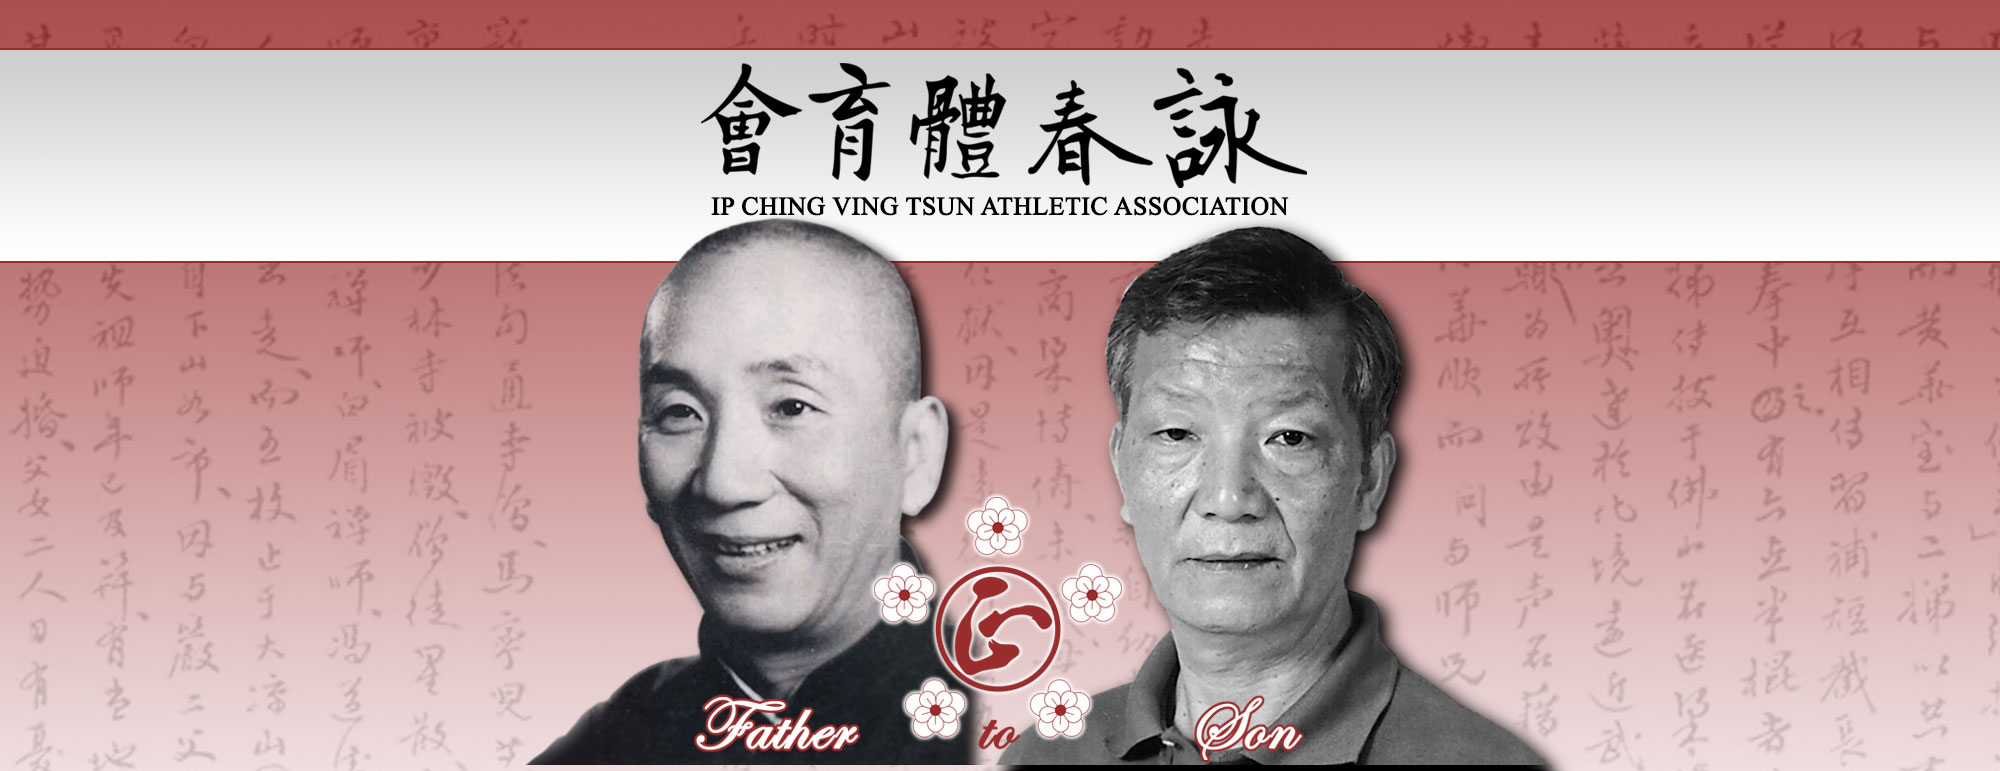 Ip Ching Ving Tsun Athletic Association U.S.